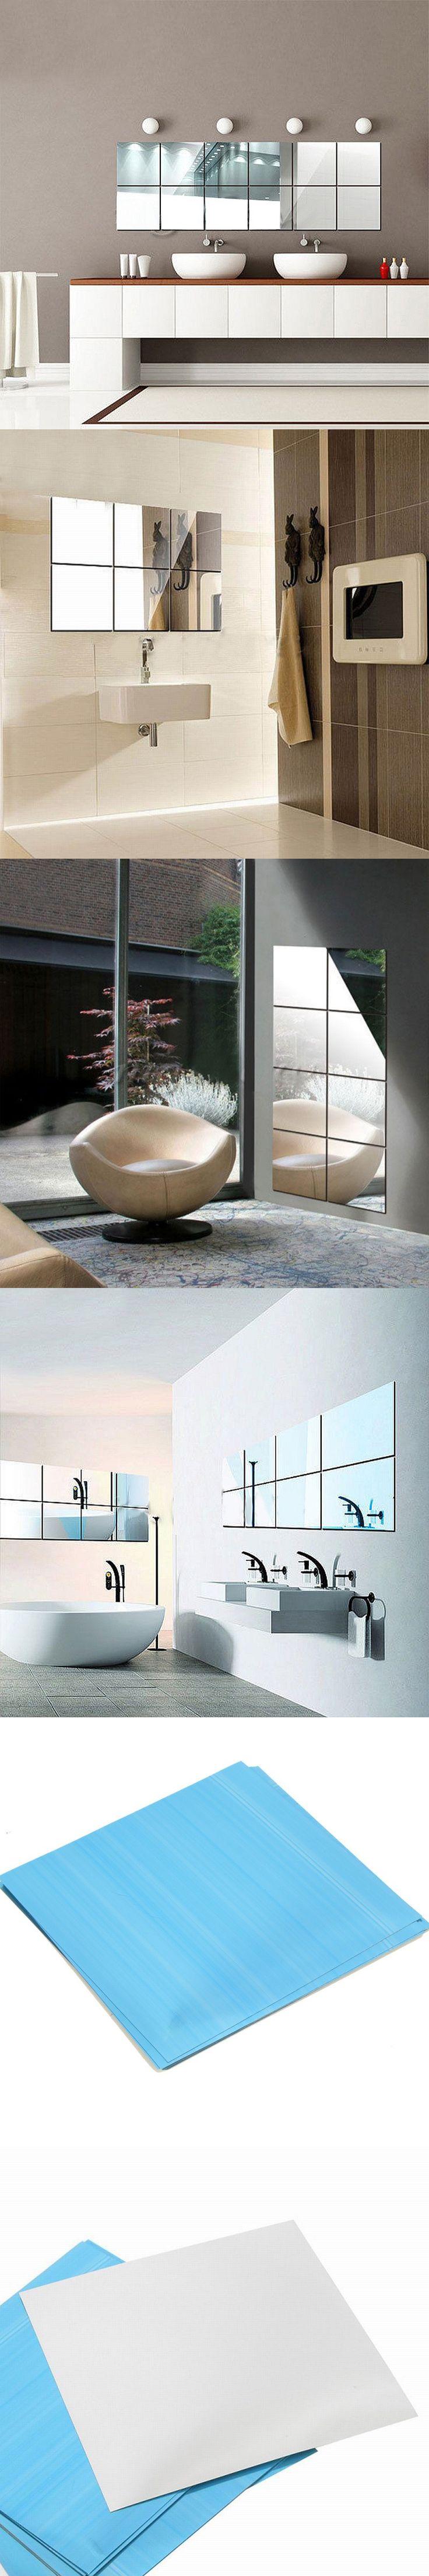 16pcs/set Self Adhesive 3D Mirrors Mosaic Tiles PVC Wall Stickers Square Shape Home Living Room Decor DIY Craft Supplies 15*15cm $6.12